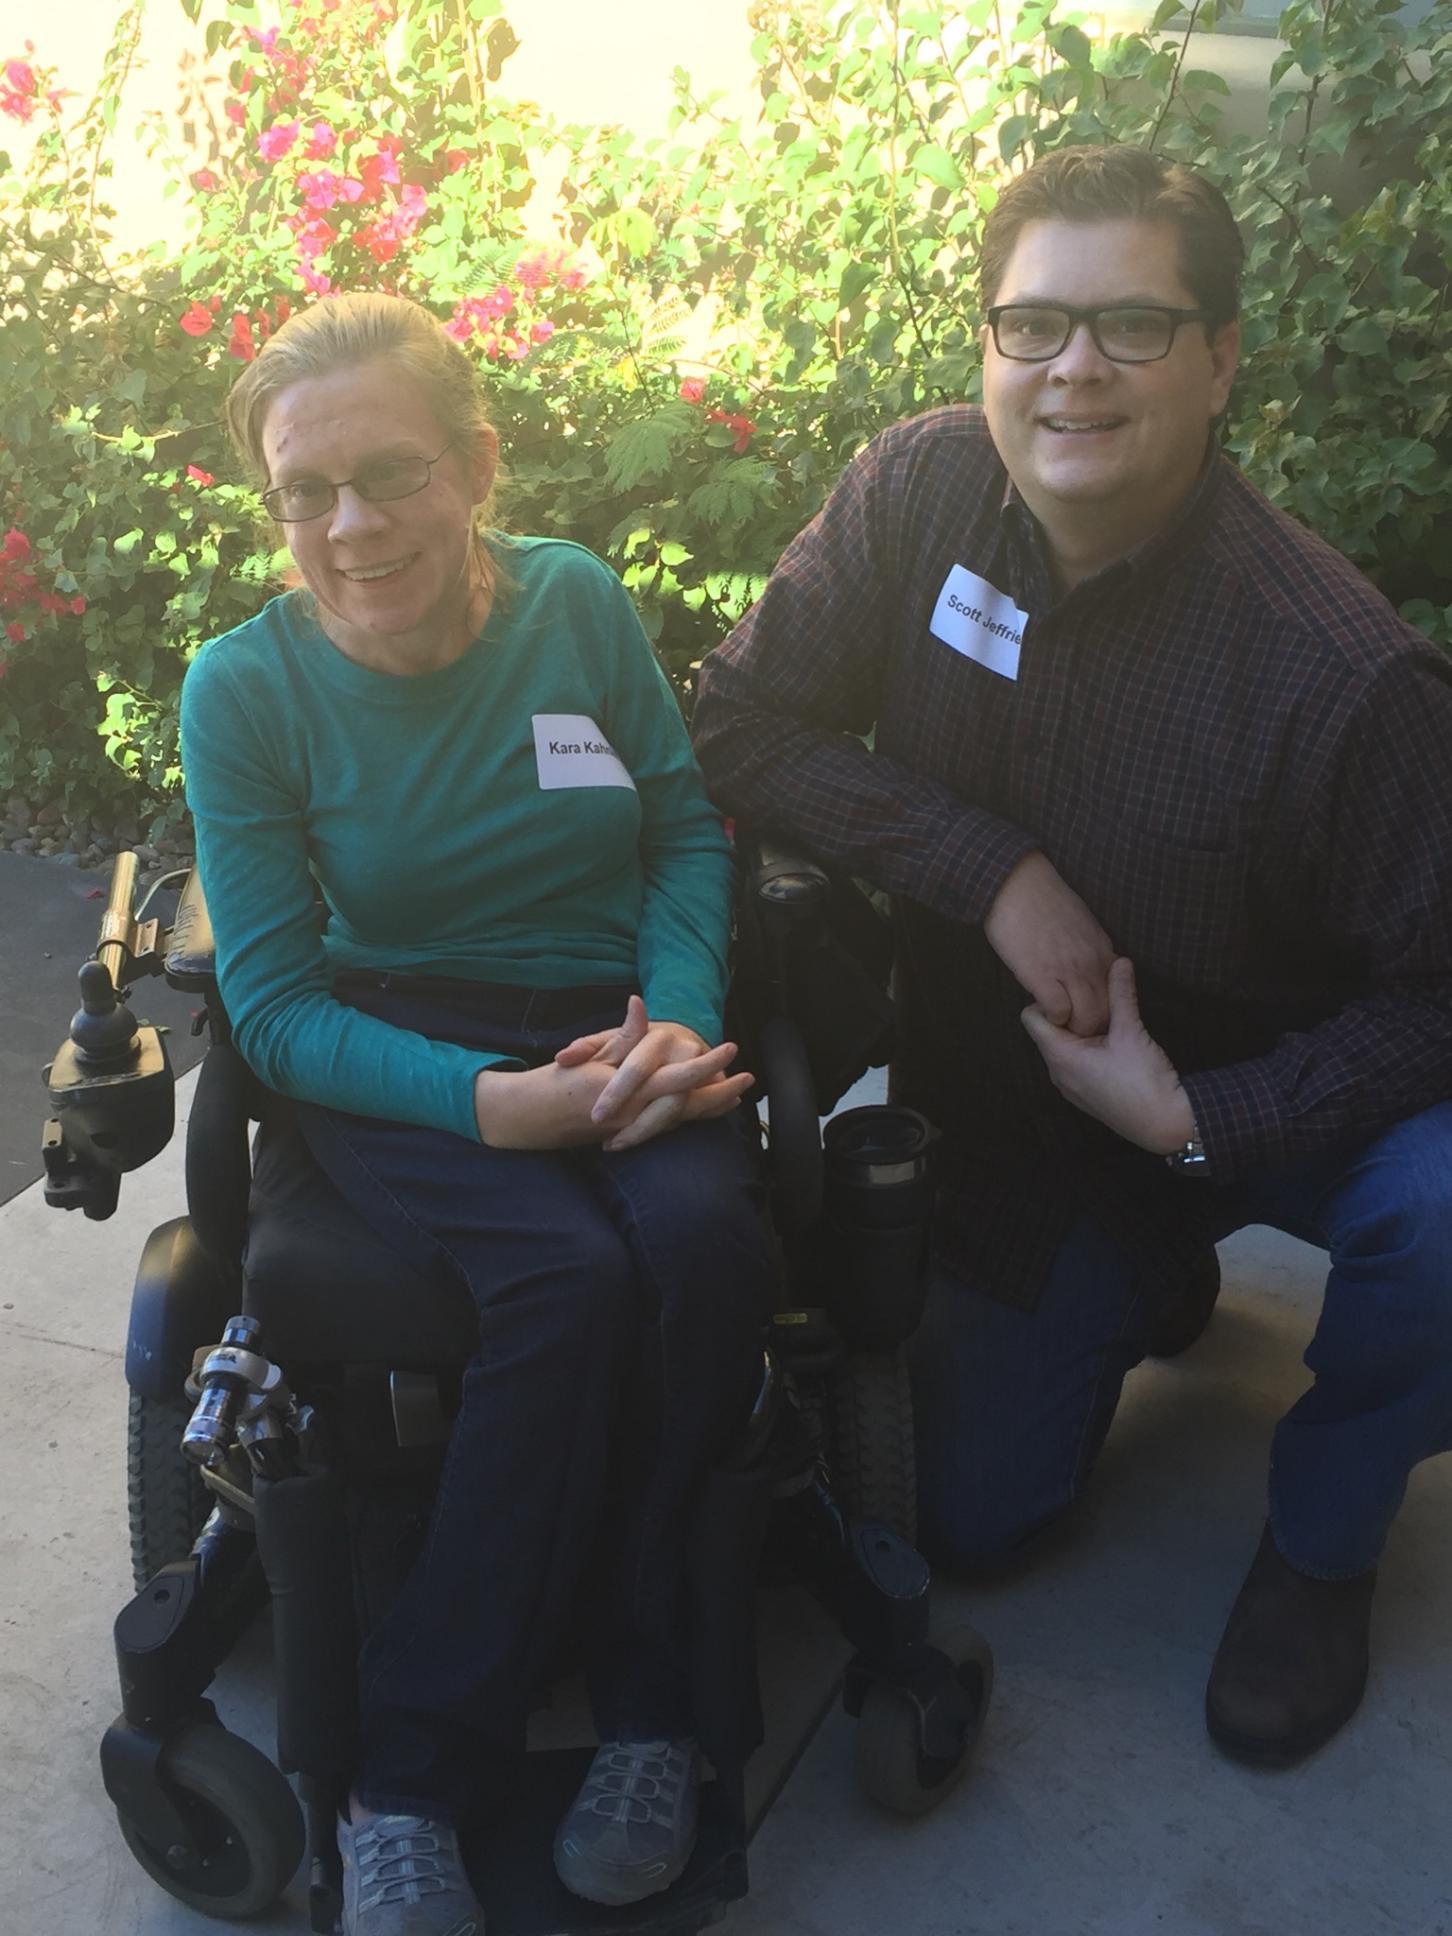 Kara Kahnke (left) poses with Scott Jeffries (right).